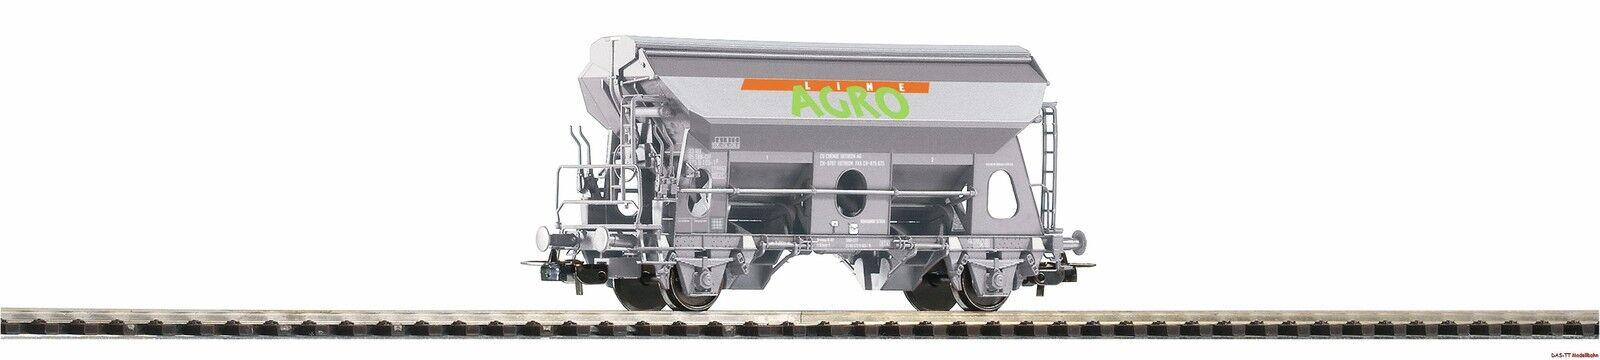 H0 Self-Unloading Car Fcs agro-line SBB Ep. V Piko 54574